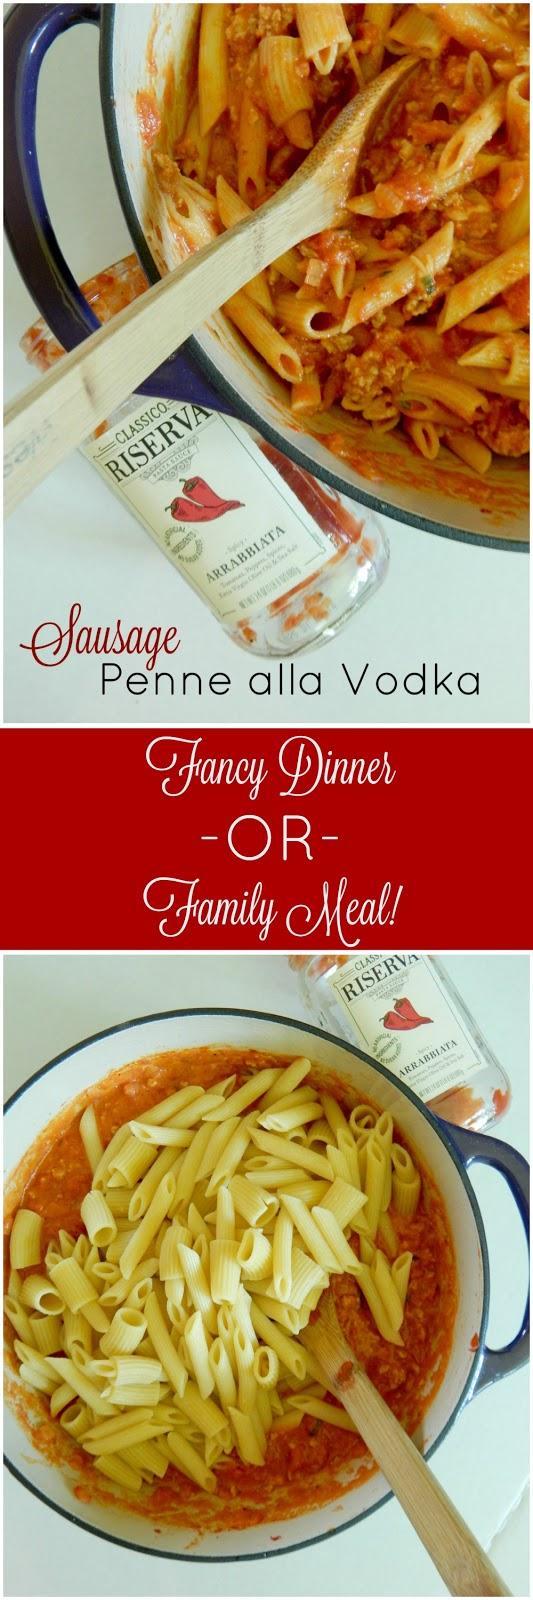 sausage penne alla vodka (sweetandsavoryfood.com)